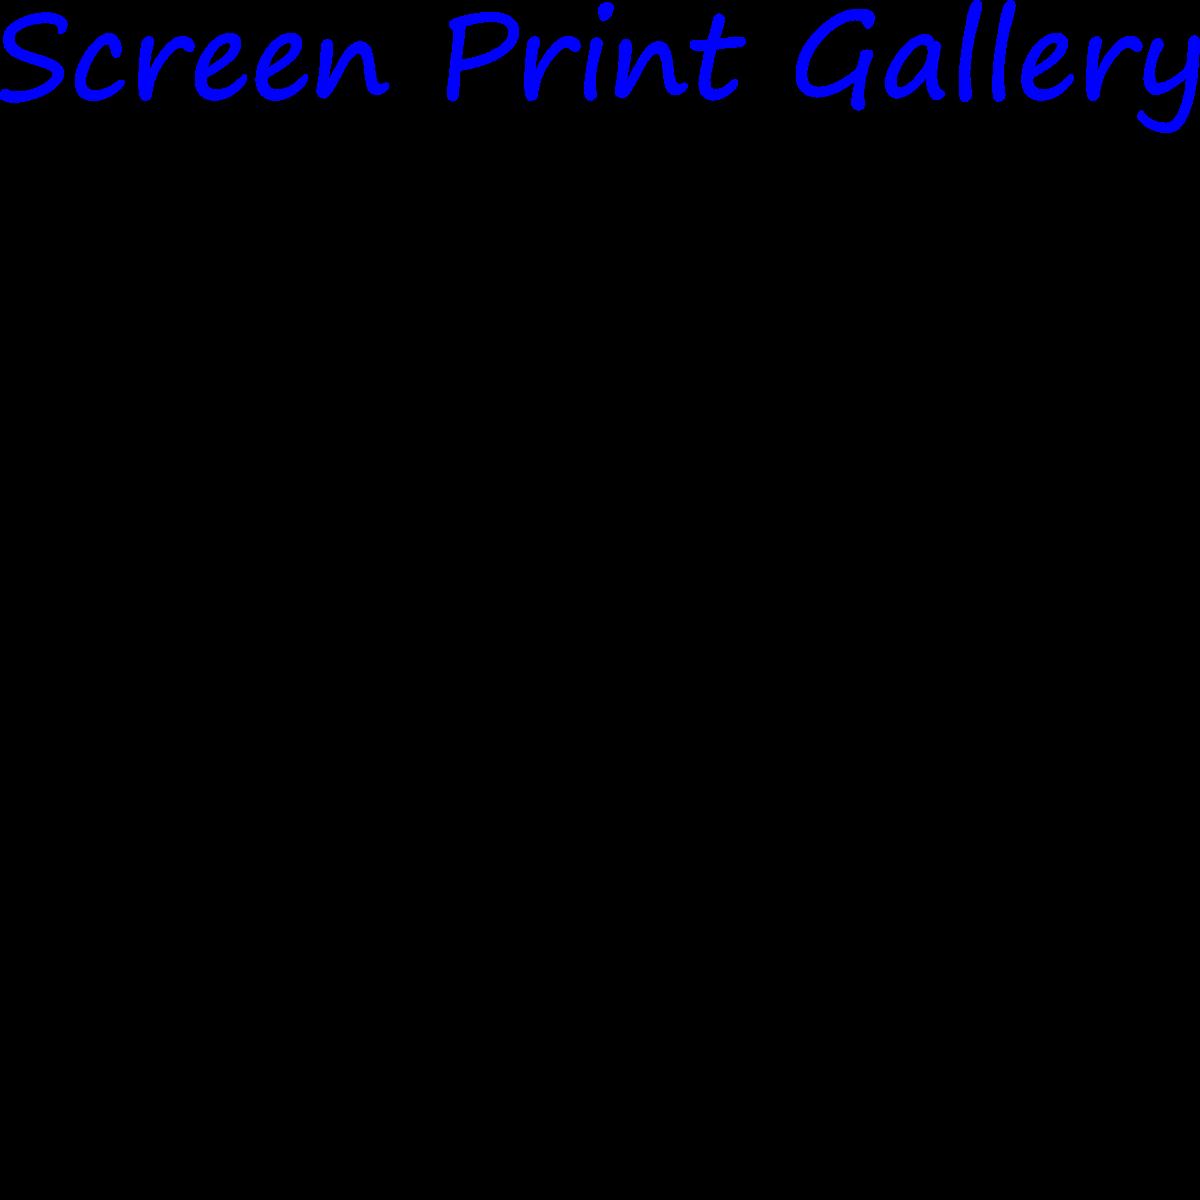 screen print gallery